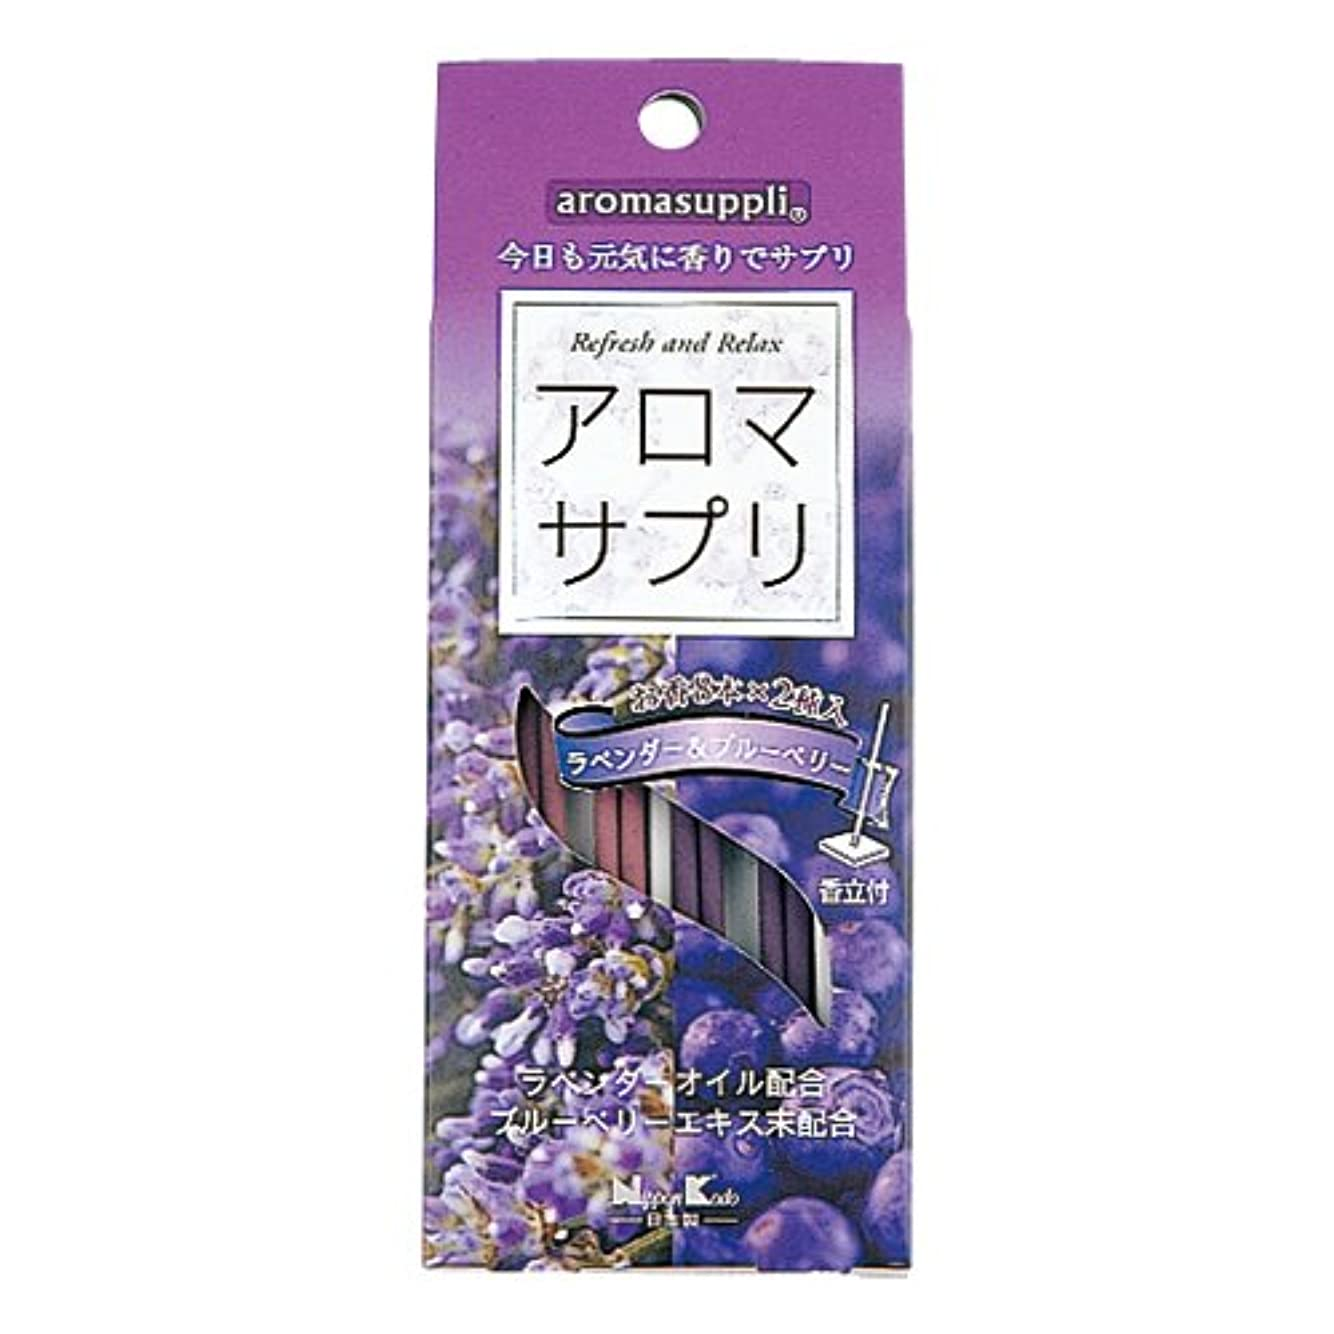 【X5個セット】 アロマサプリ ラベンダー&ブルーベリー 8本入×2種